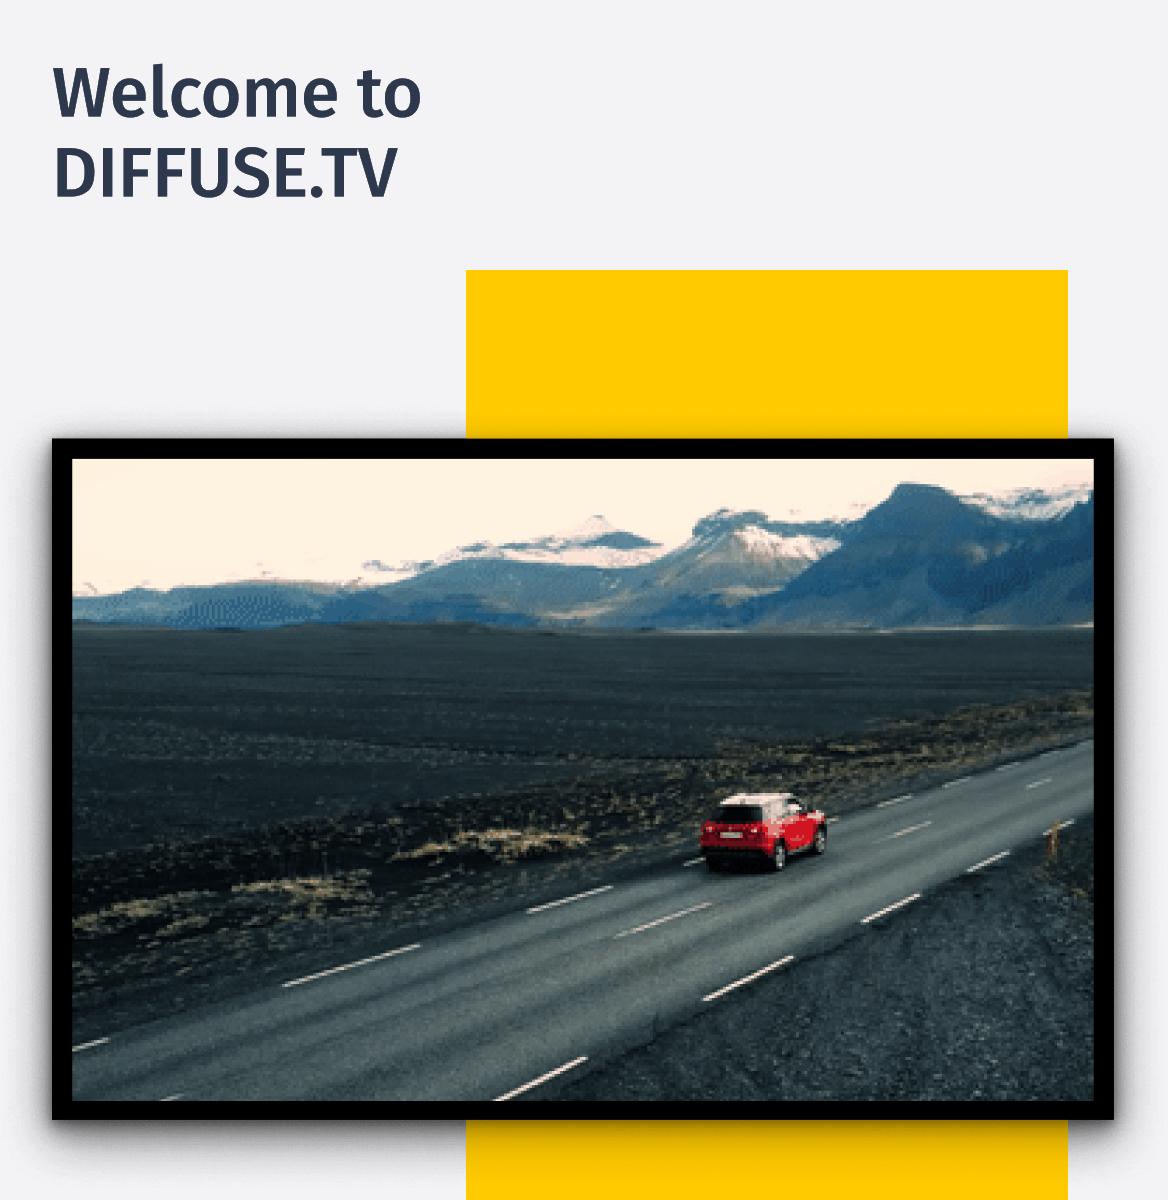 Diffuse.TV - Bringing the DOOH to Digital Screens